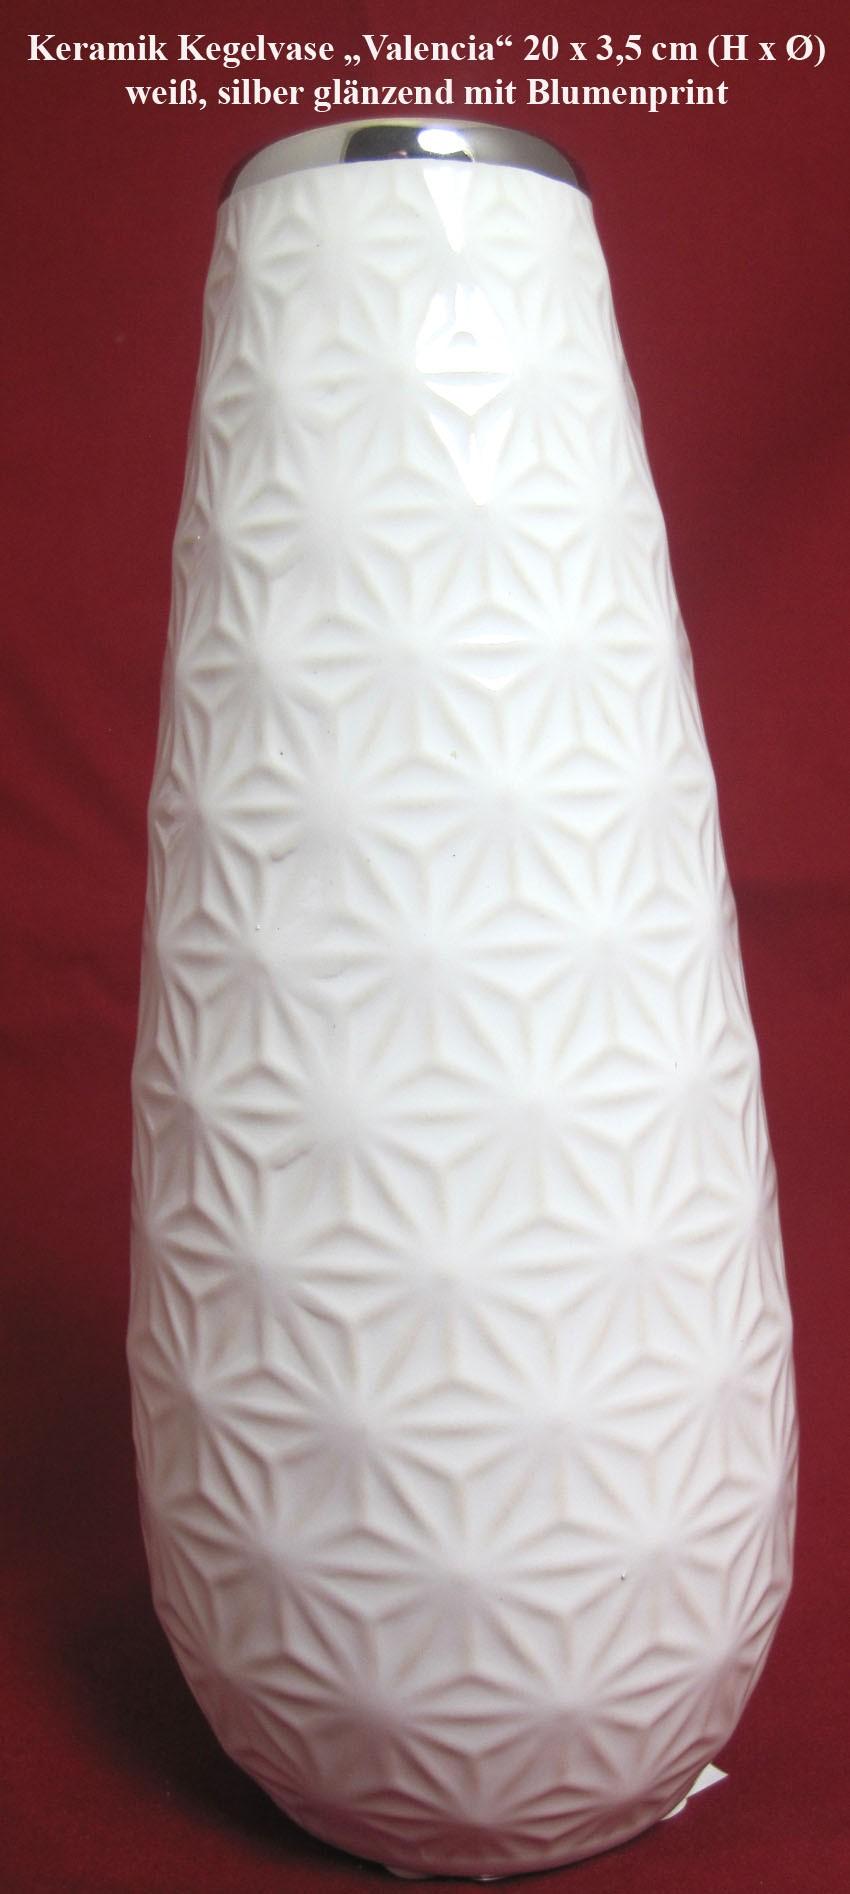 "Keramik Kegelvase ""Valencia"" weiß/silber glänzend, Blumenprint ca.20x8 cm (HxØ)"